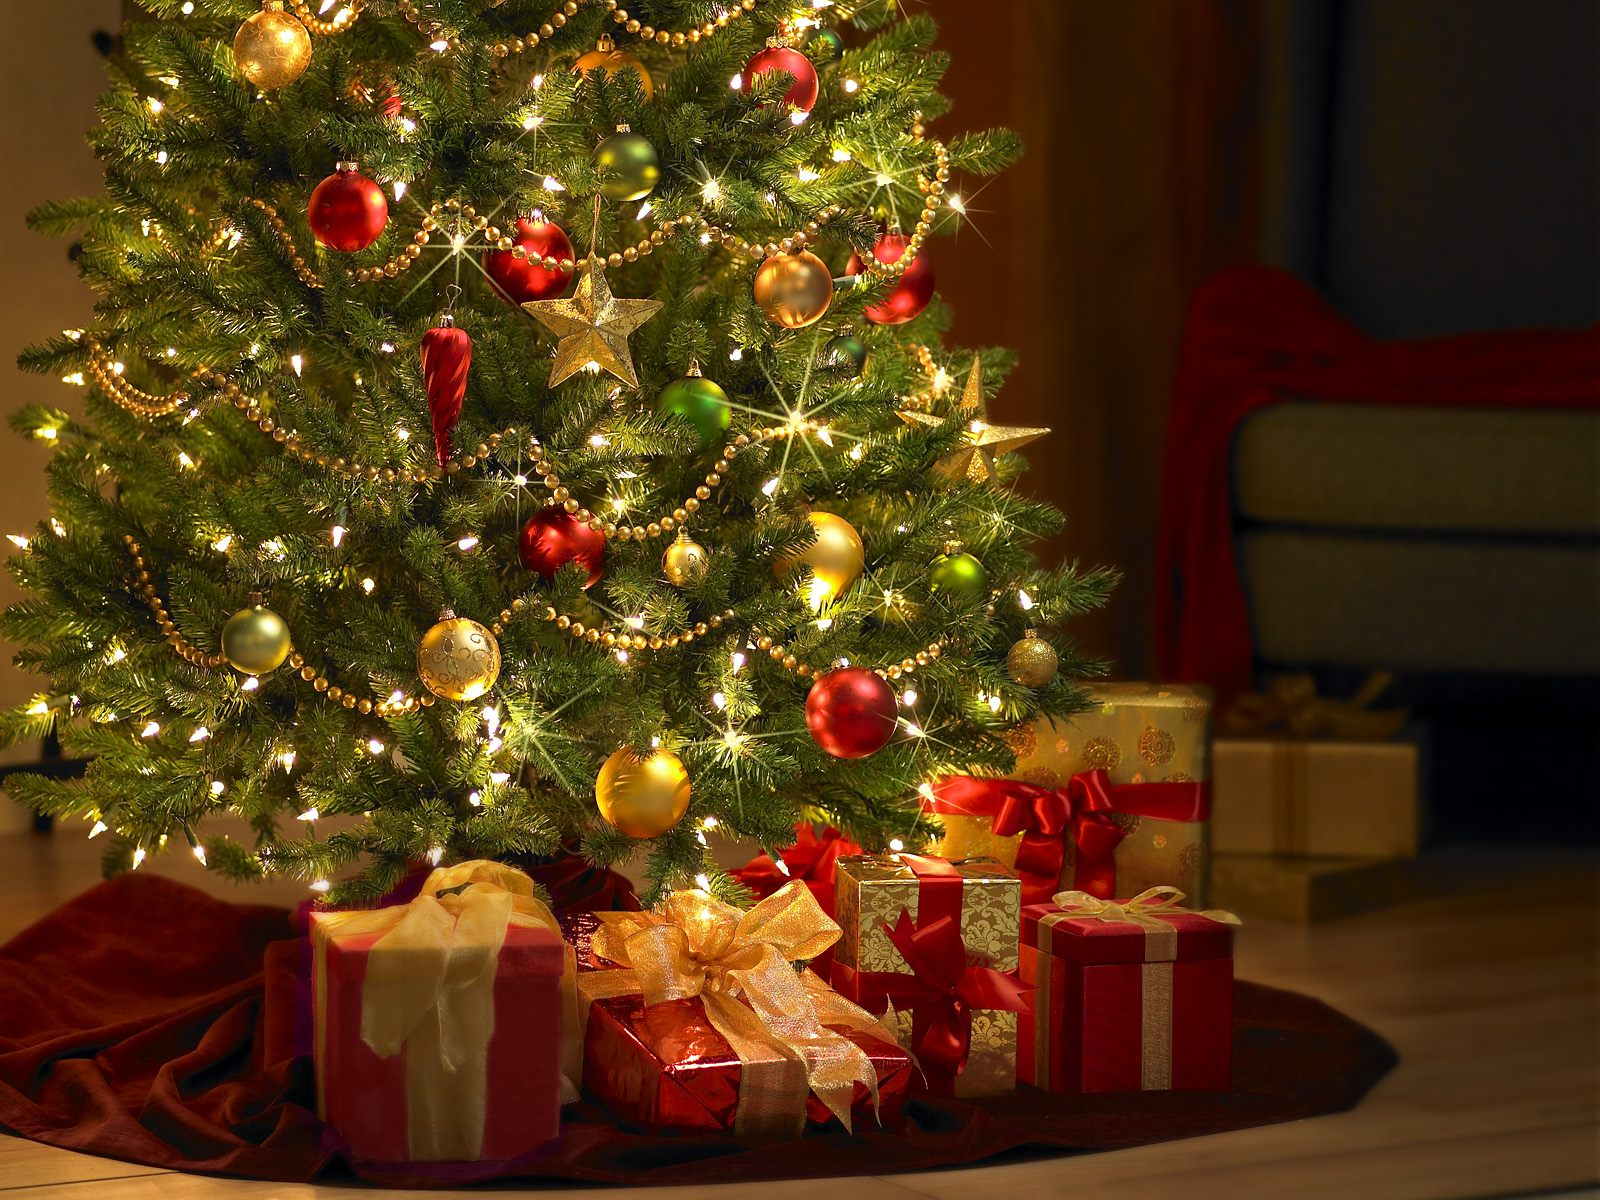 http://2.bp.blogspot.com/-uYbbpZVYdm8/TtGAQTlxP6I/AAAAAAAAAp8/IEpzoCwFLmI/s1600/animated-christmas-tree-computer-wallpaper.jpg